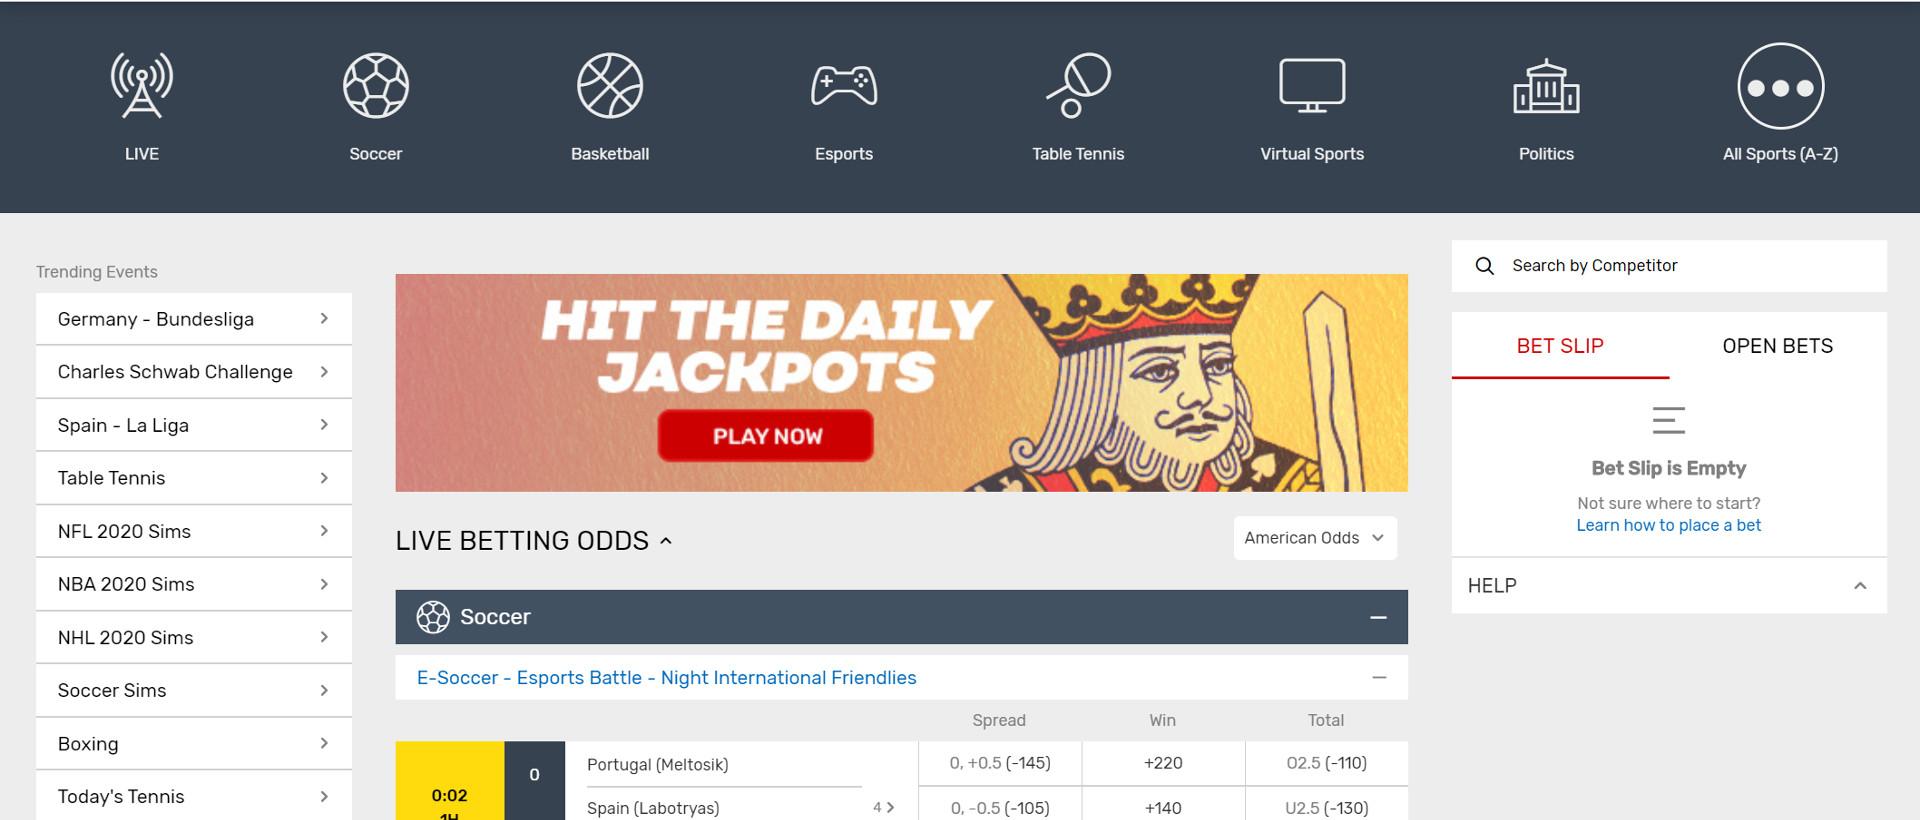 Star casino recensioni, star casino japanese – Perfil – INGLÊS ONLINE COM NATIVOS   FÓRUM